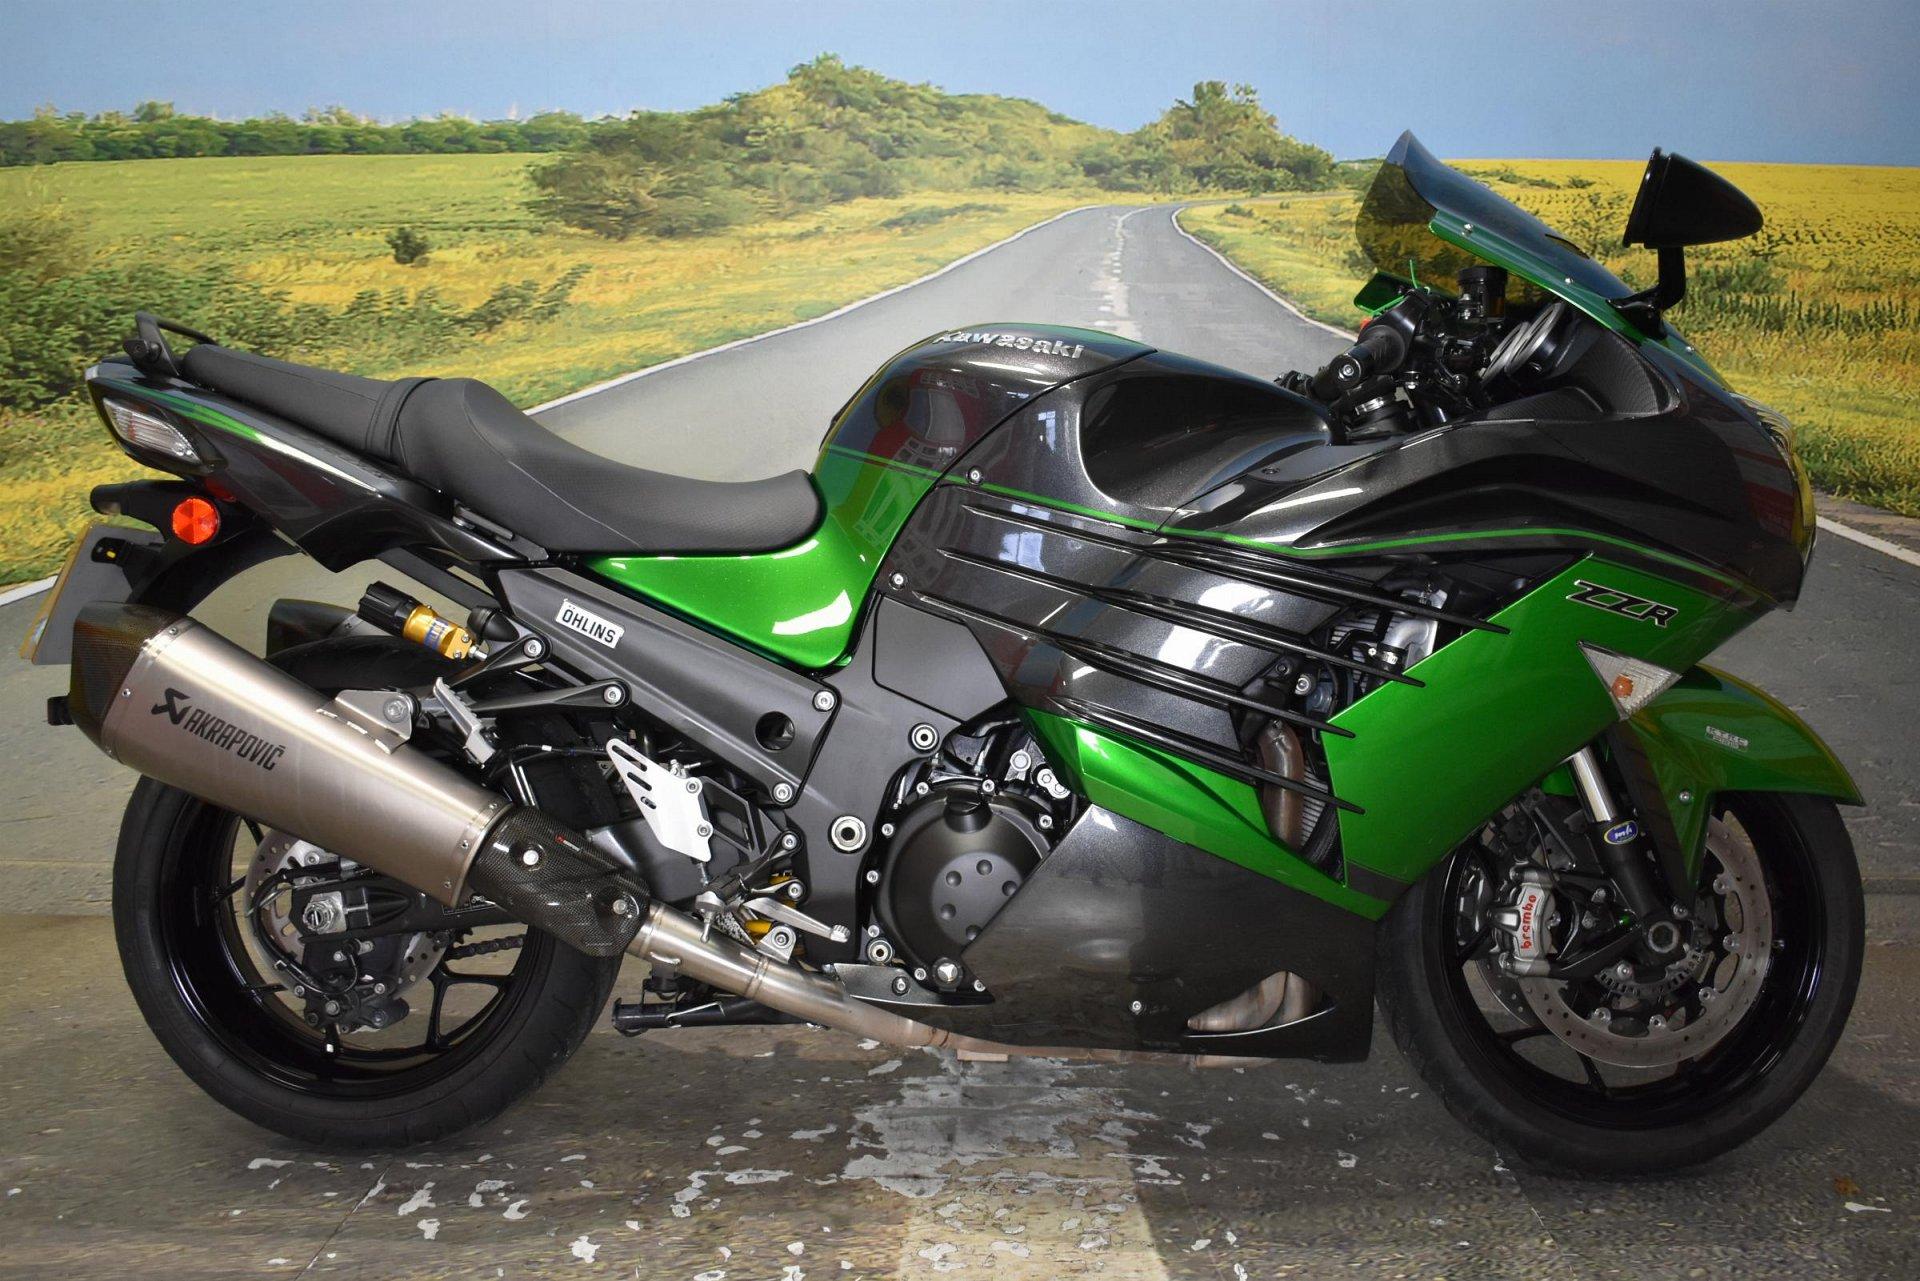 2018 Kawasaki ZZR1400  Performance Sport for sale in Derbyshire